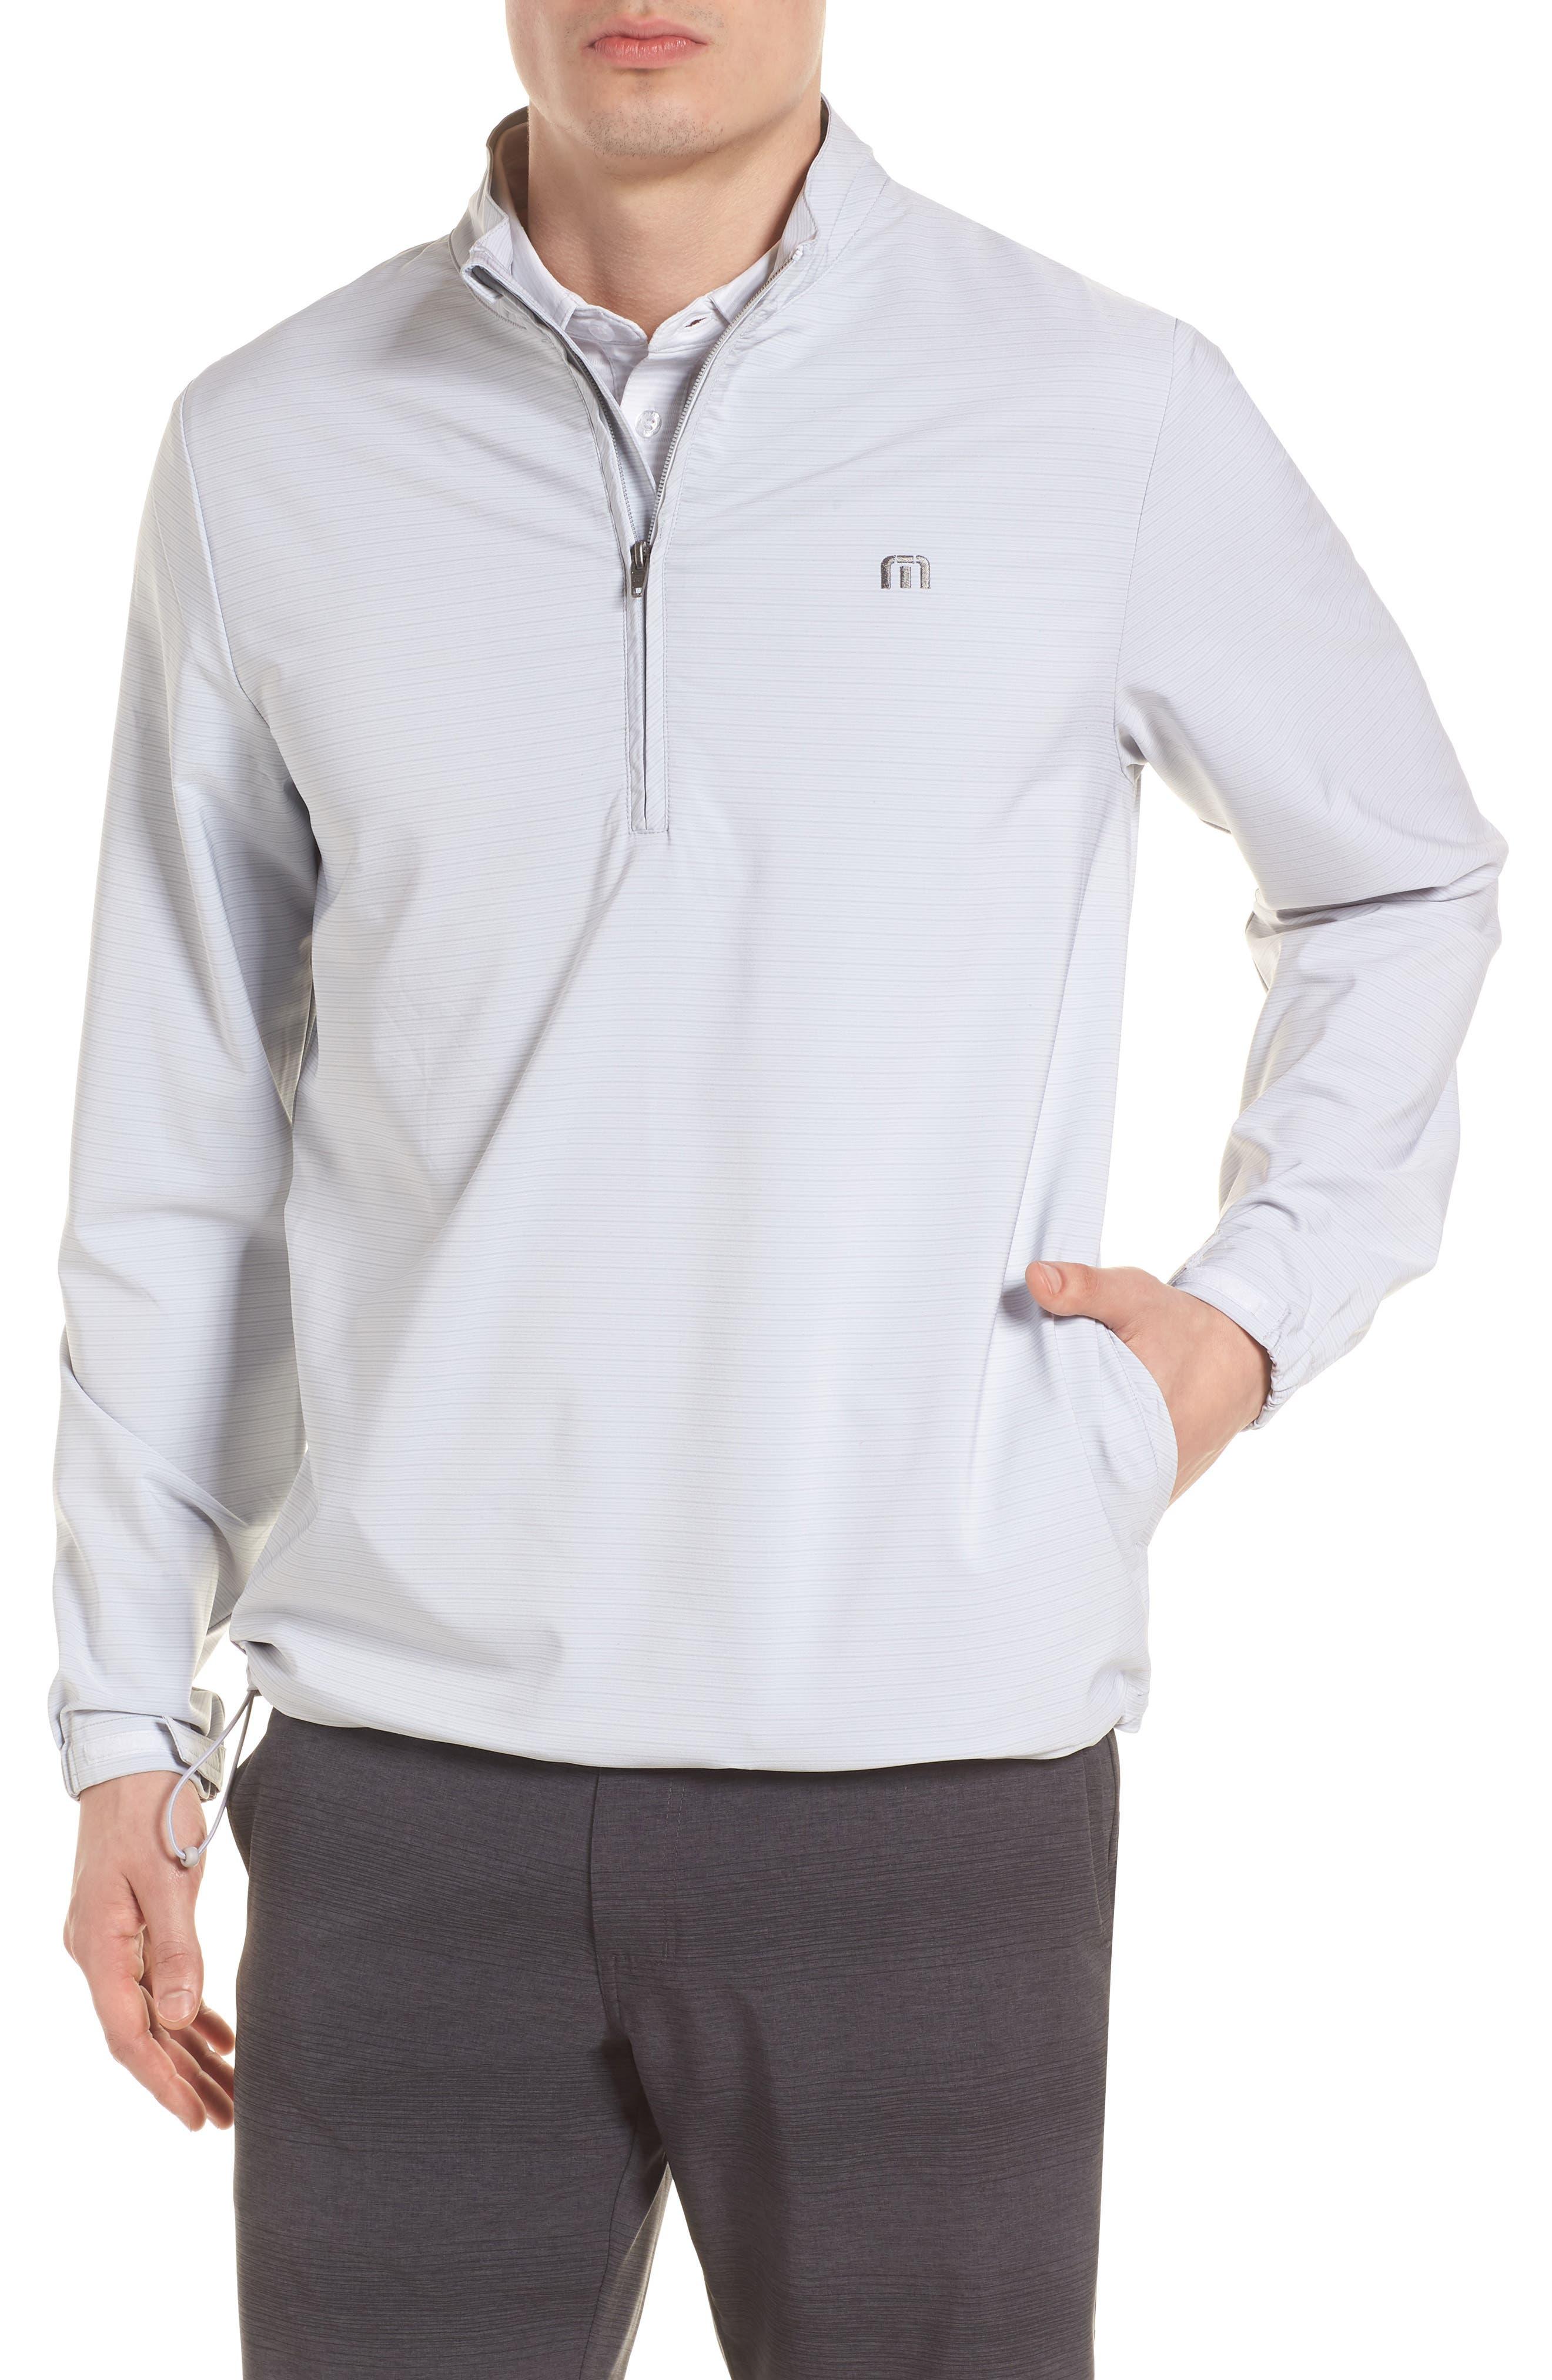 Luca Quarter Zip Pullover,                         Main,                         color, Micro Chip/ White